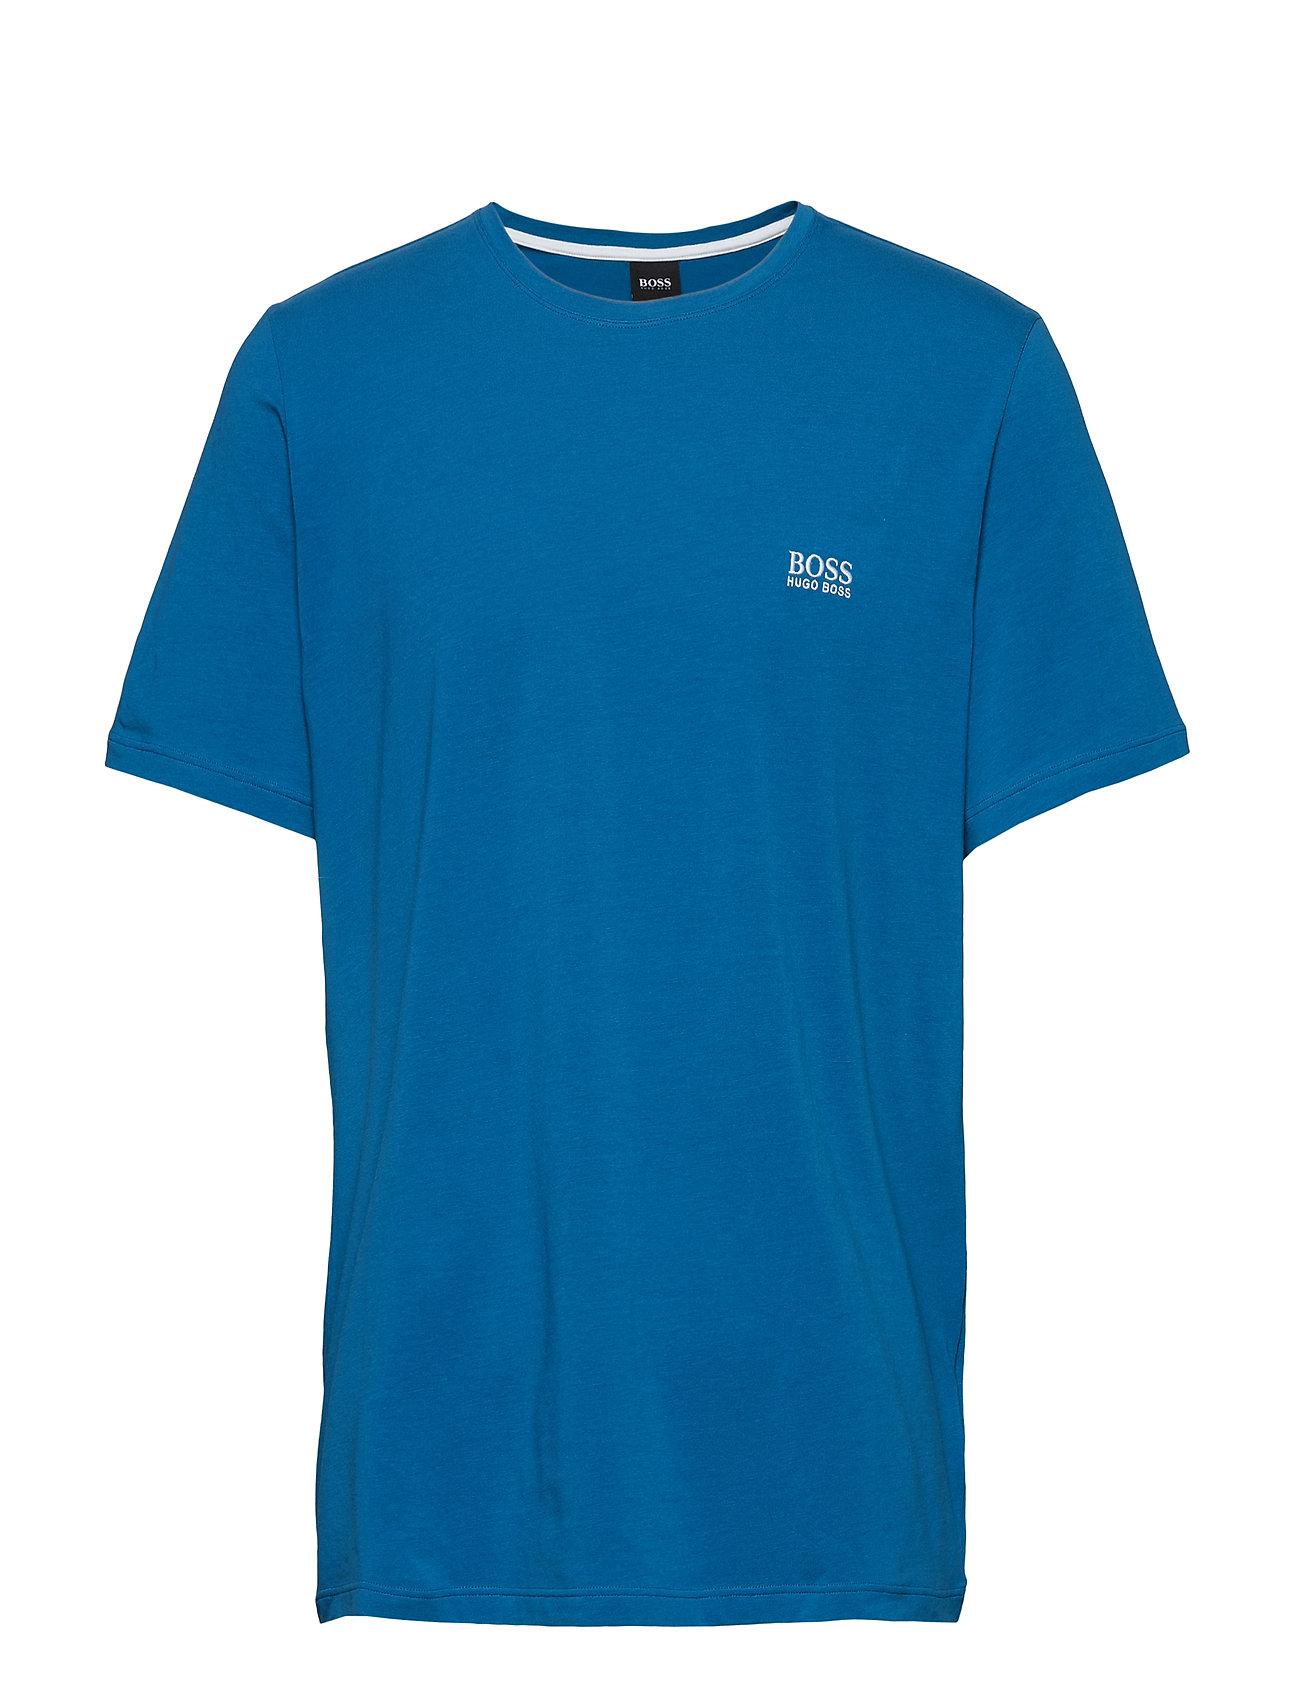 BOSS Business Wear Mix&Match T-Shirt R - TURQUOISE/AQUA